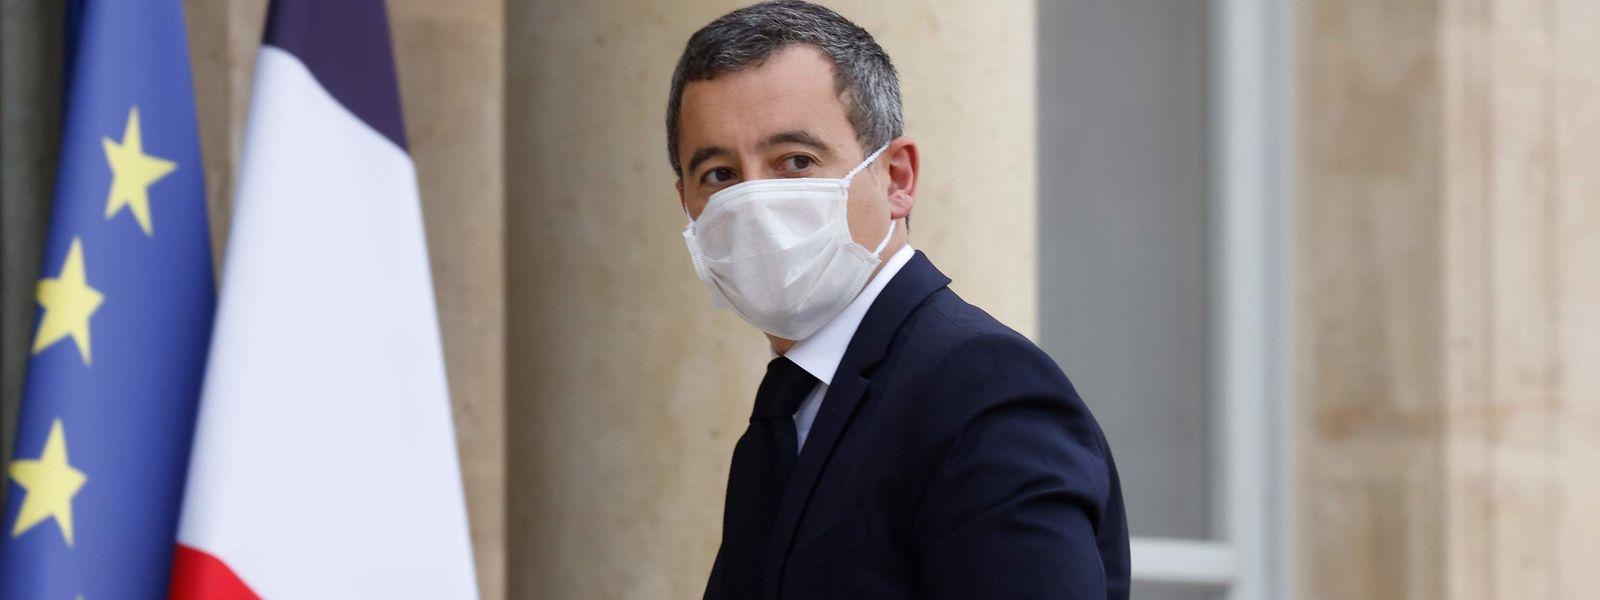 Frankreichs Innenminister Gérald Darmanin.